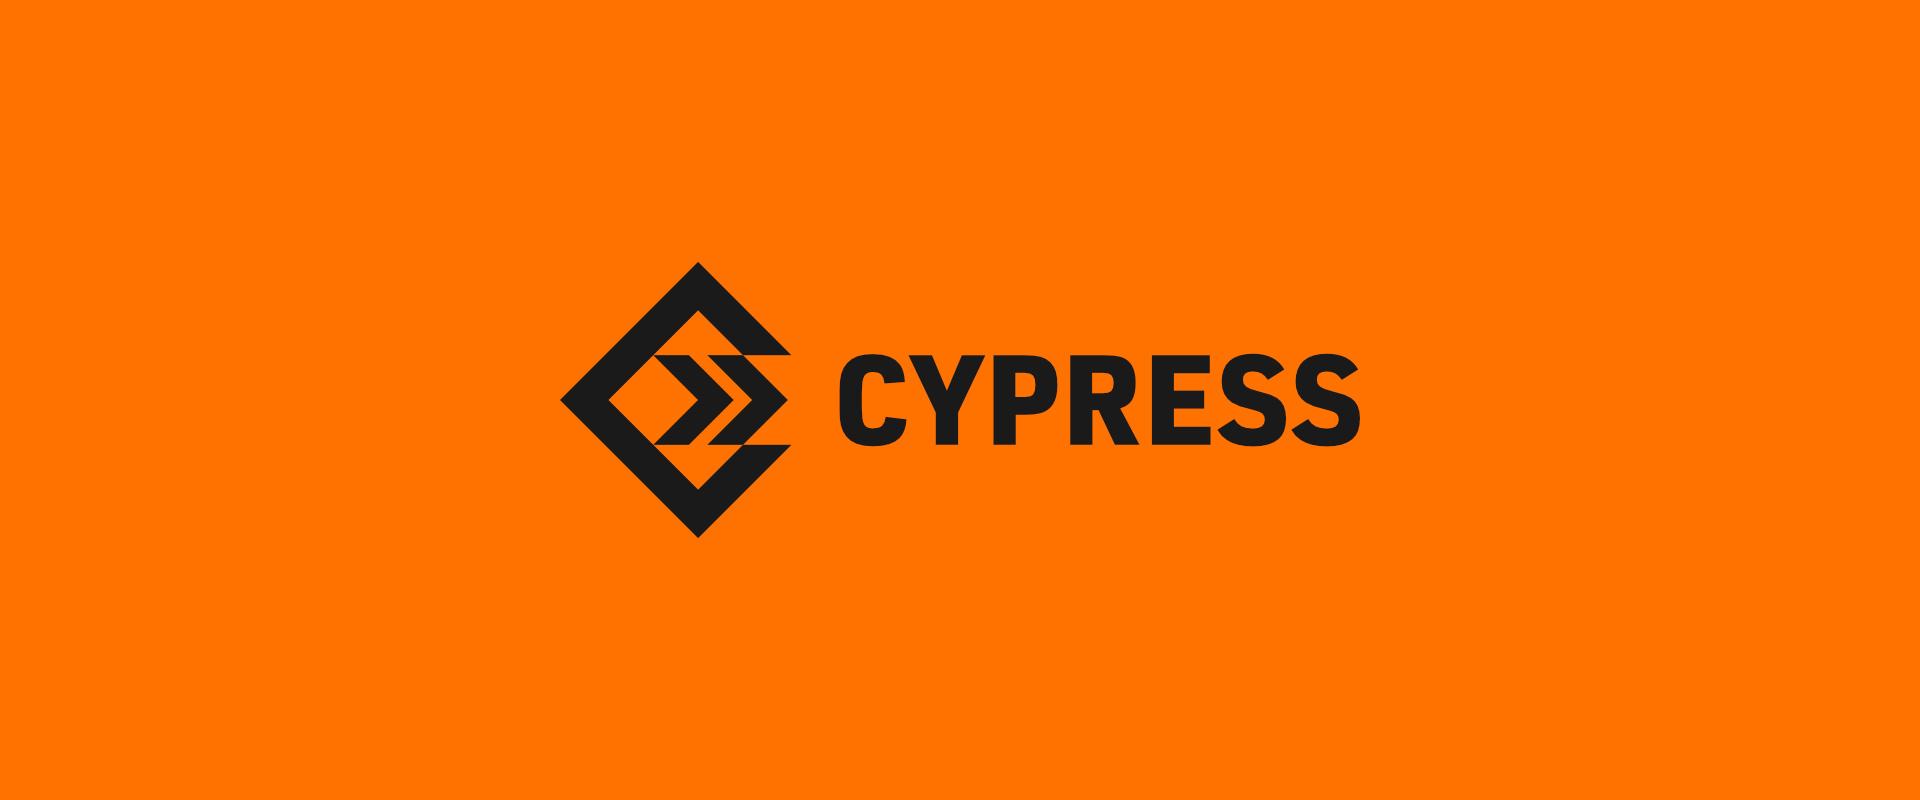 Cypress Safety - logo design